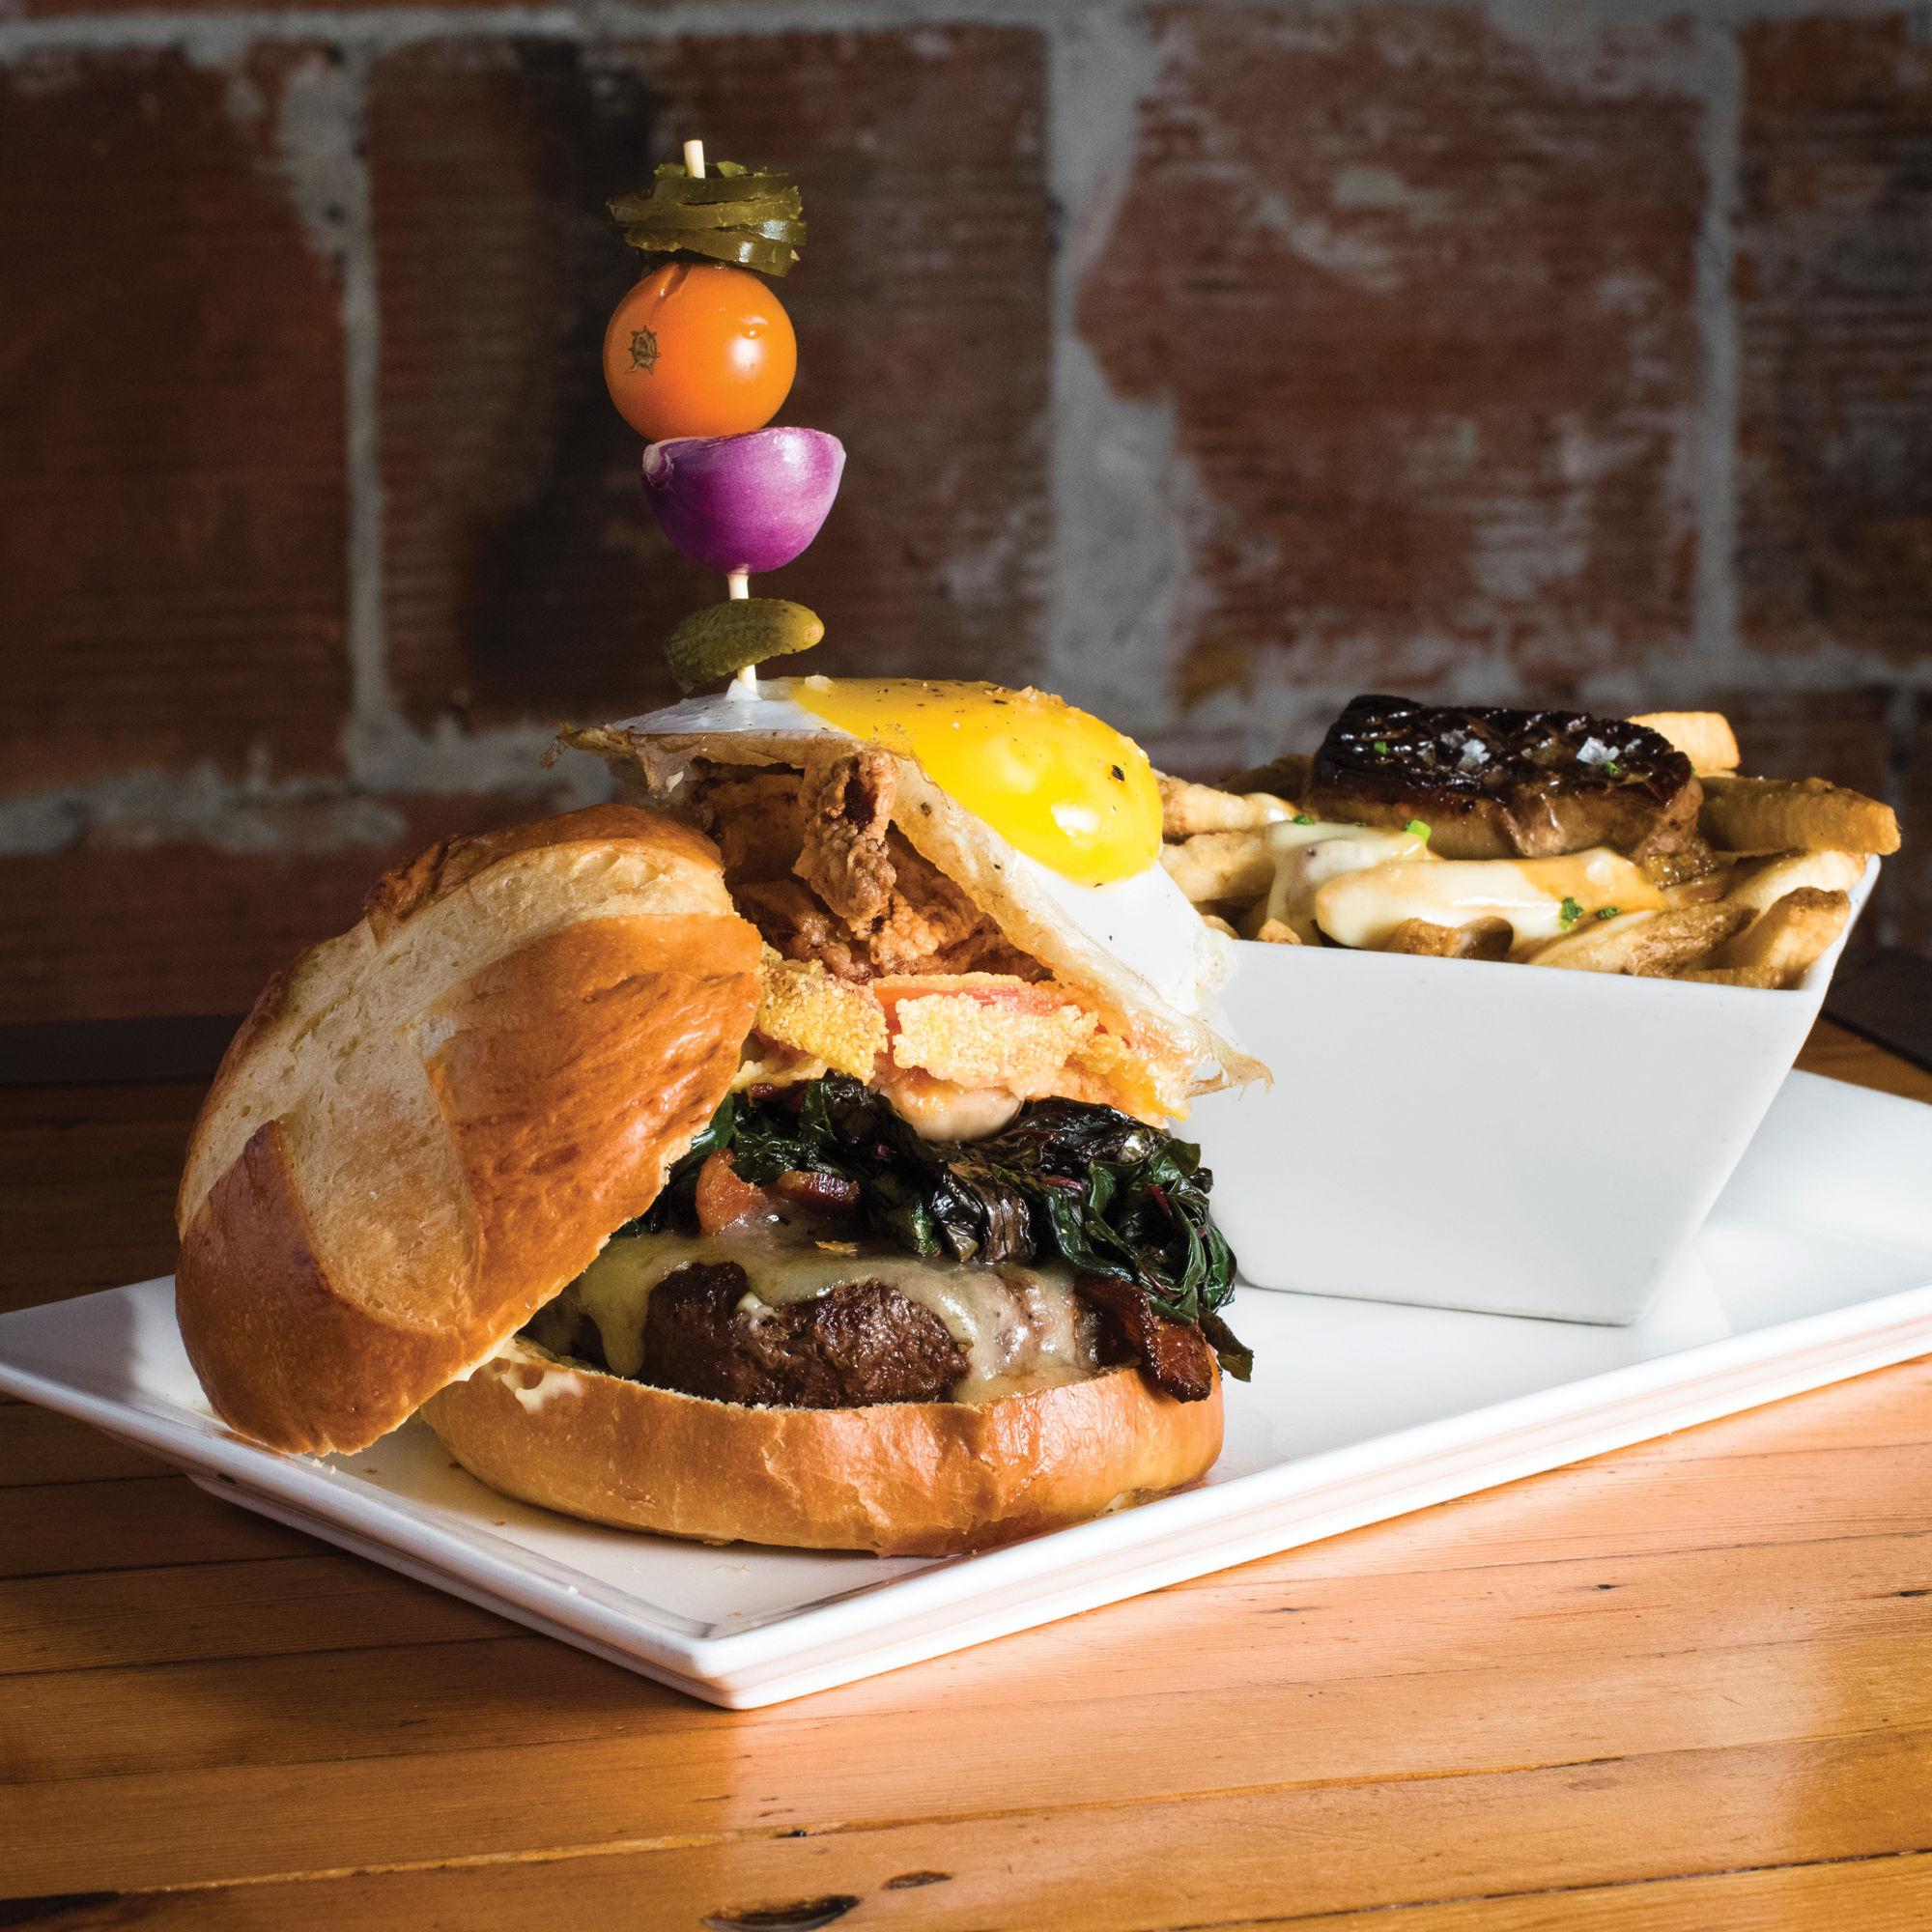 Quinns burger w42obz